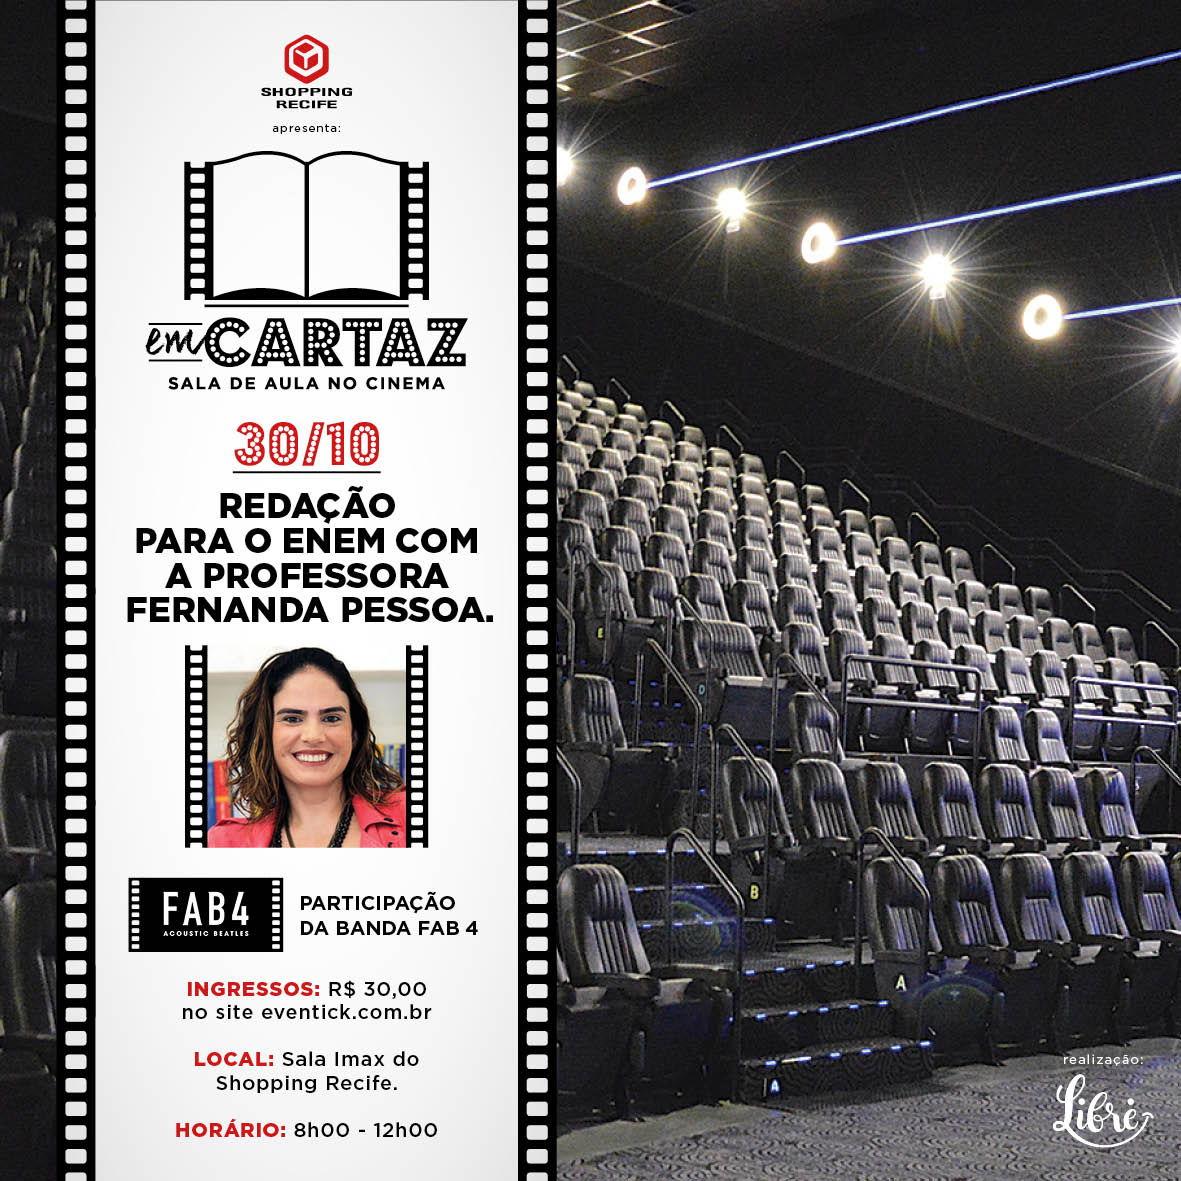 Insta Cinema.jpg